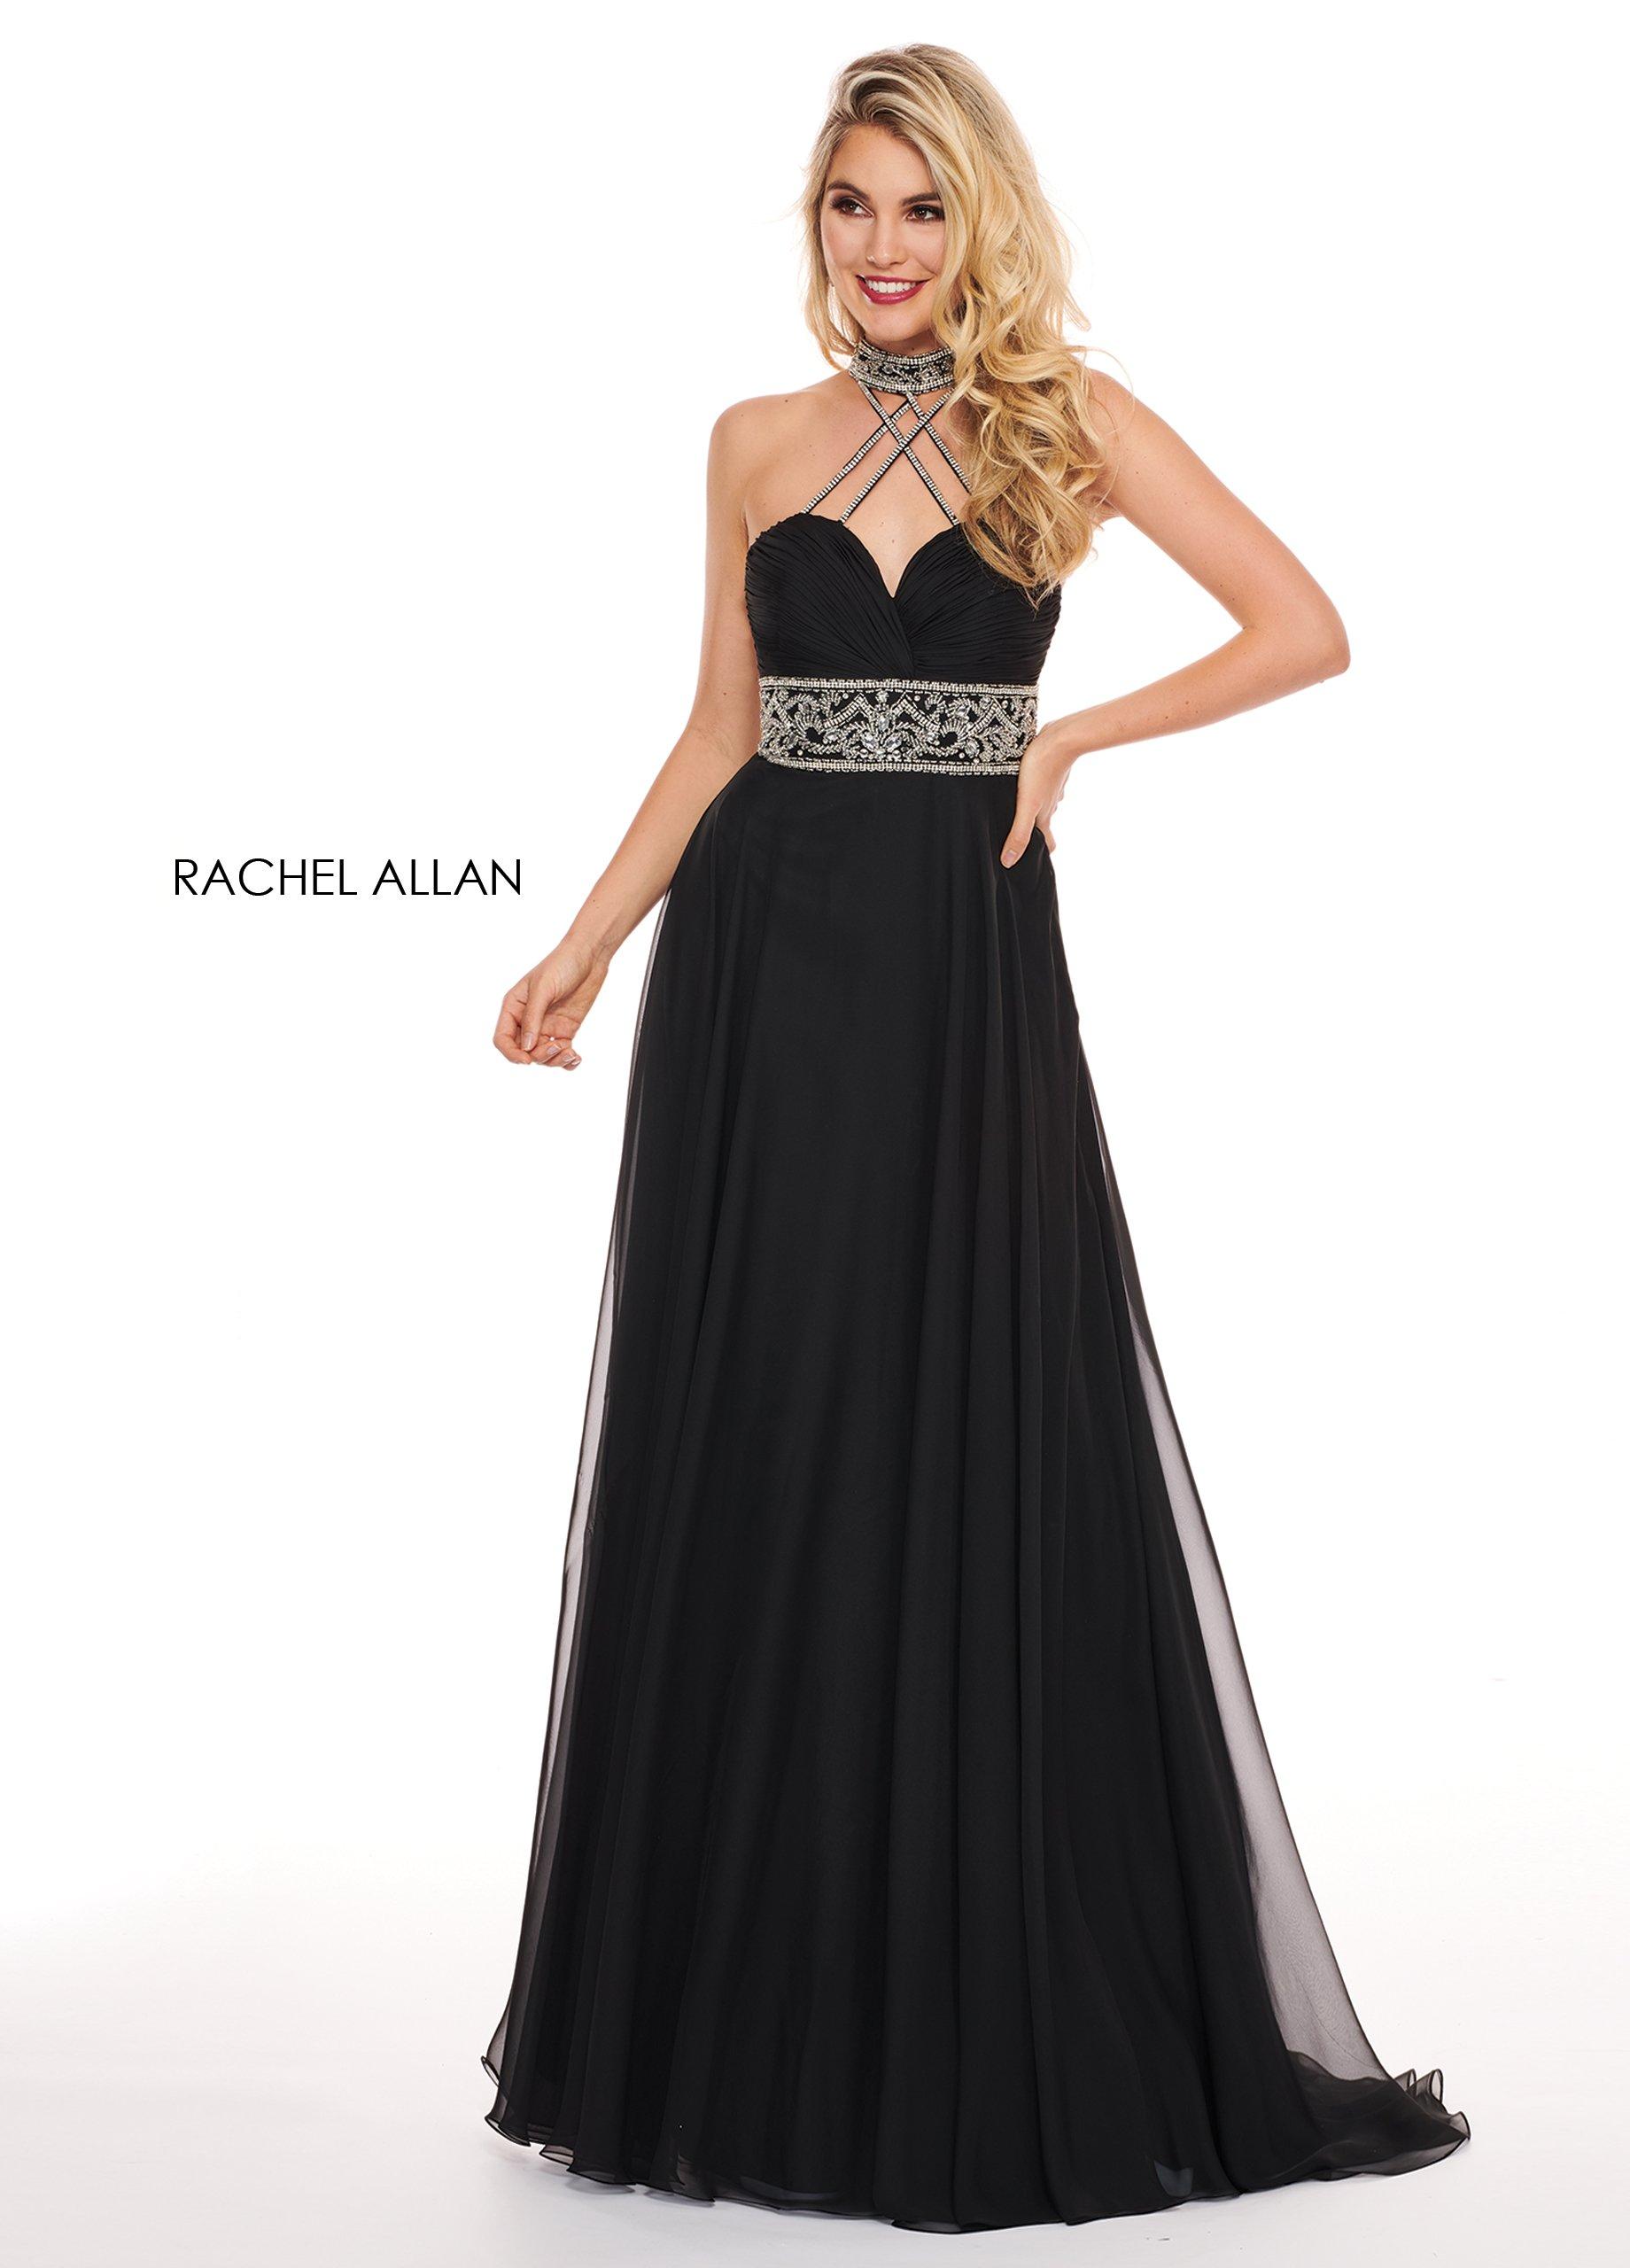 Rachel Allan - 6421 Rhinestone Ornate Collared Sweetheart Chiffon Gown